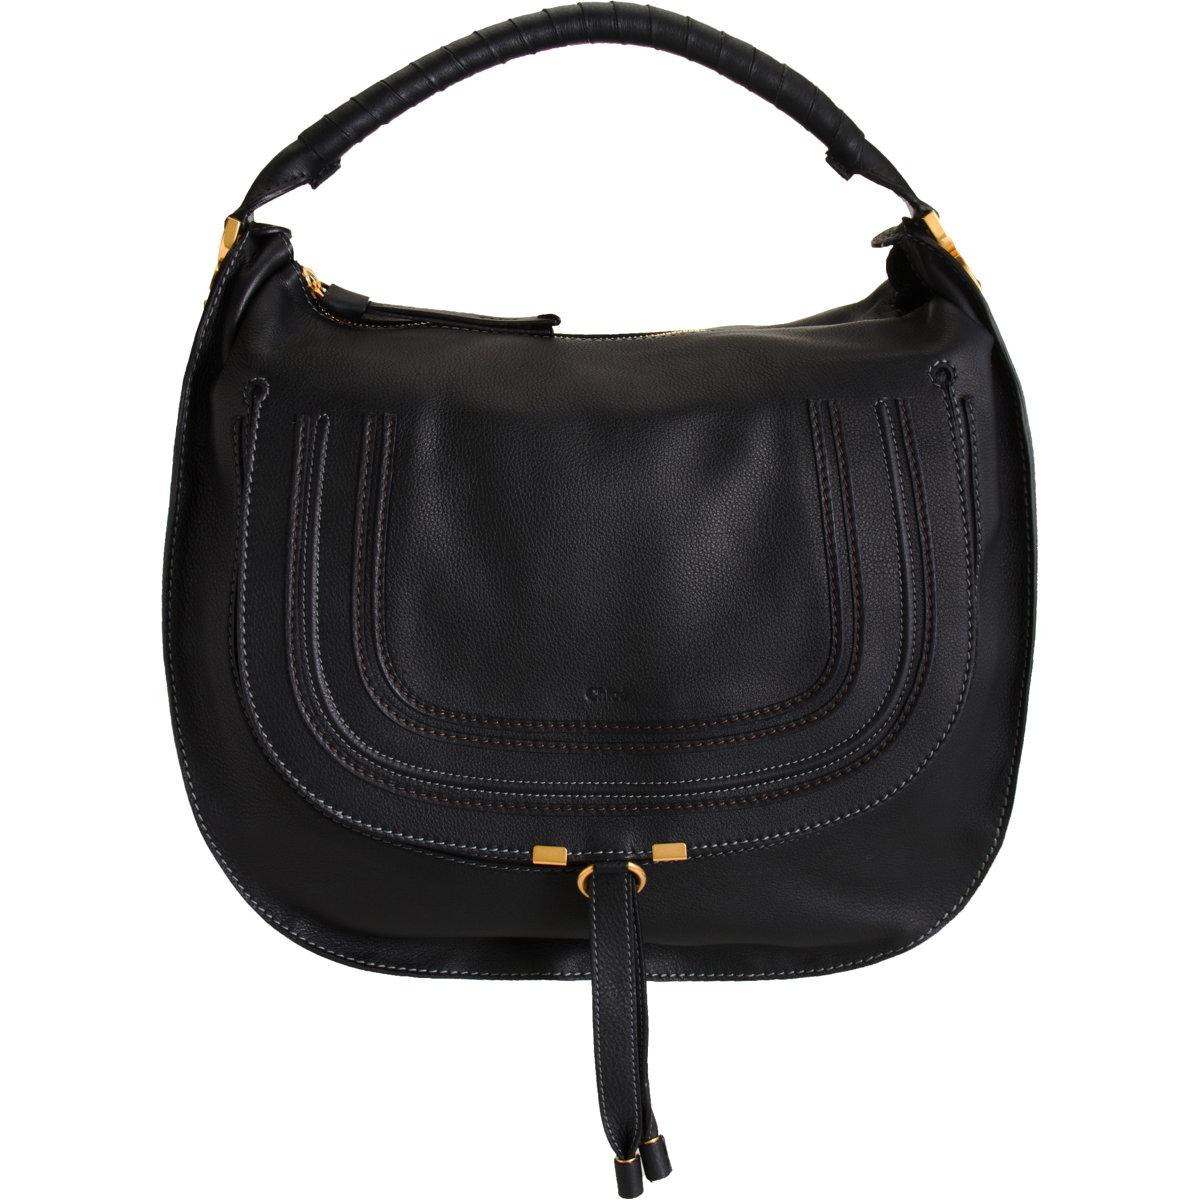 Chloe Marcie Hobo Bag Price